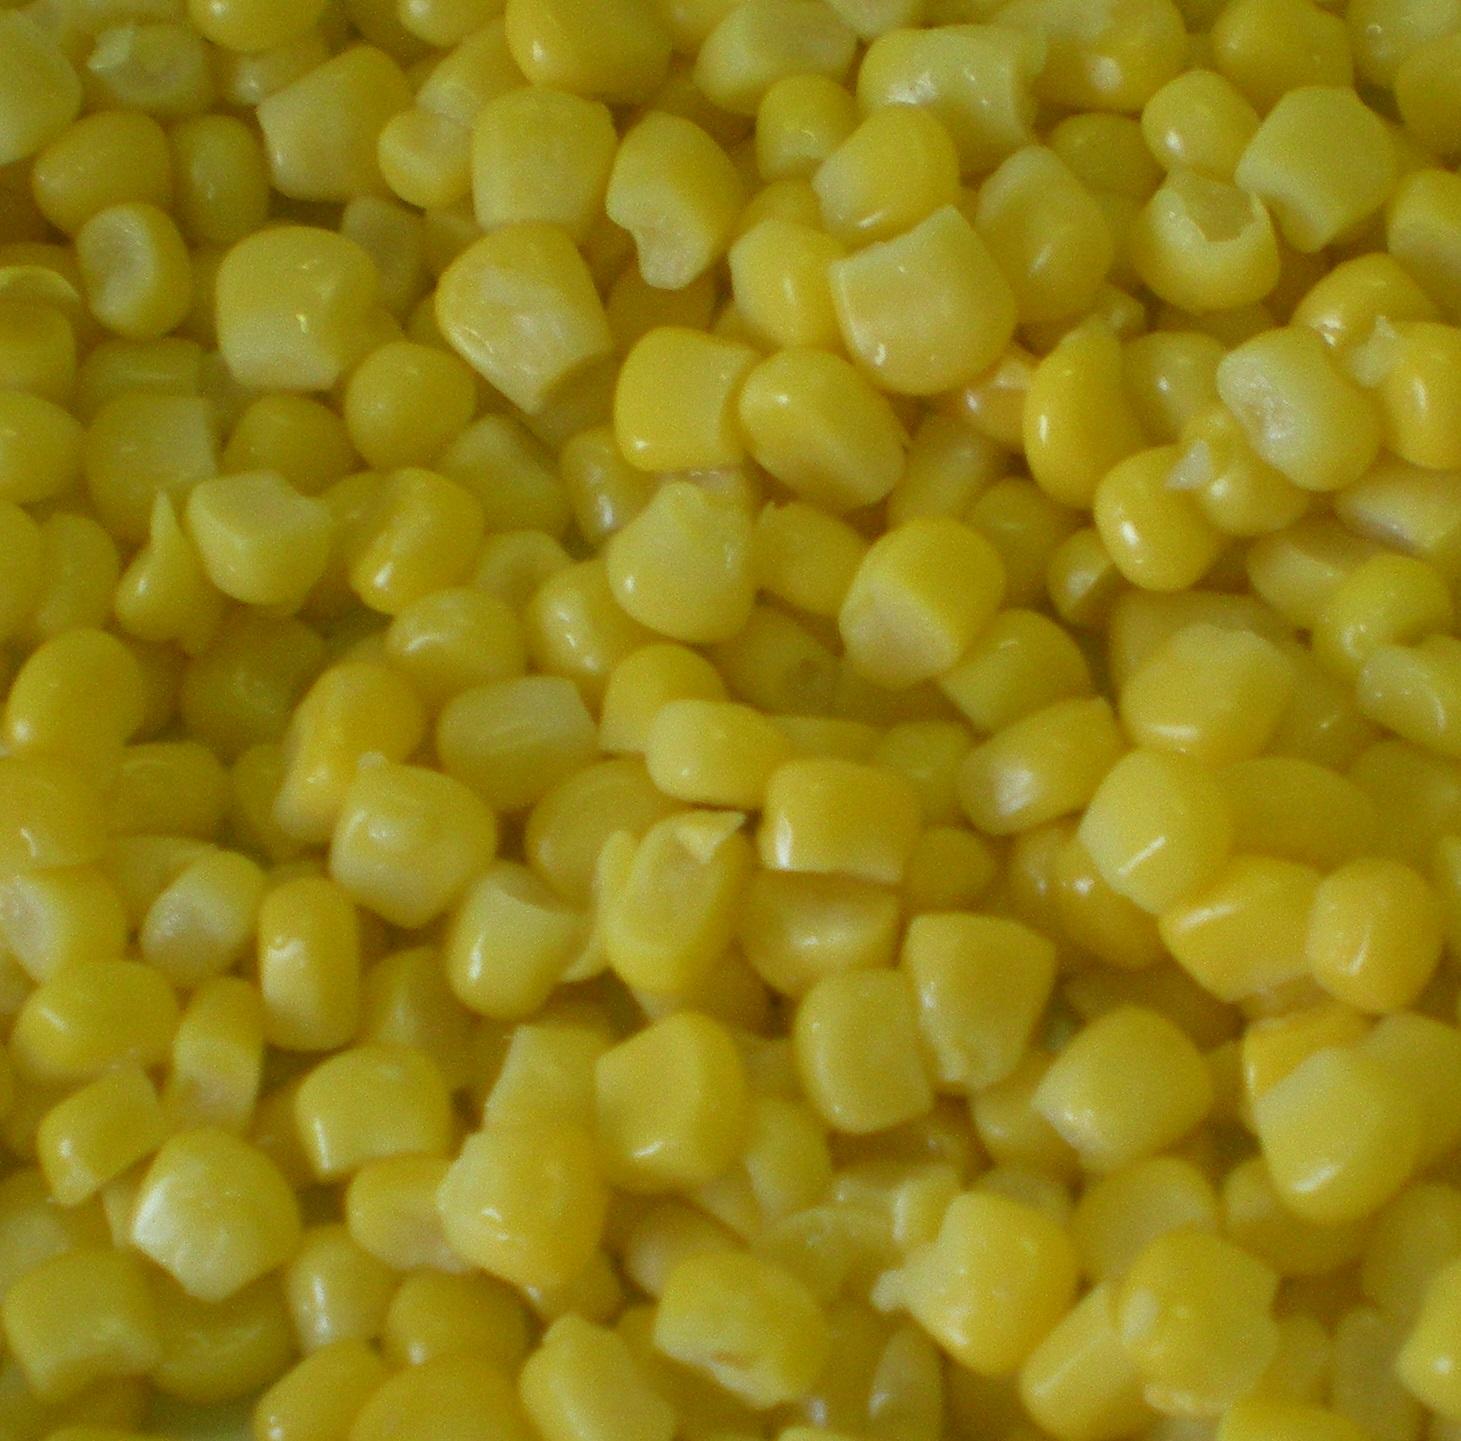 Wholesale frozen corn kernels - Garden Fresh by Kühne & Heitz